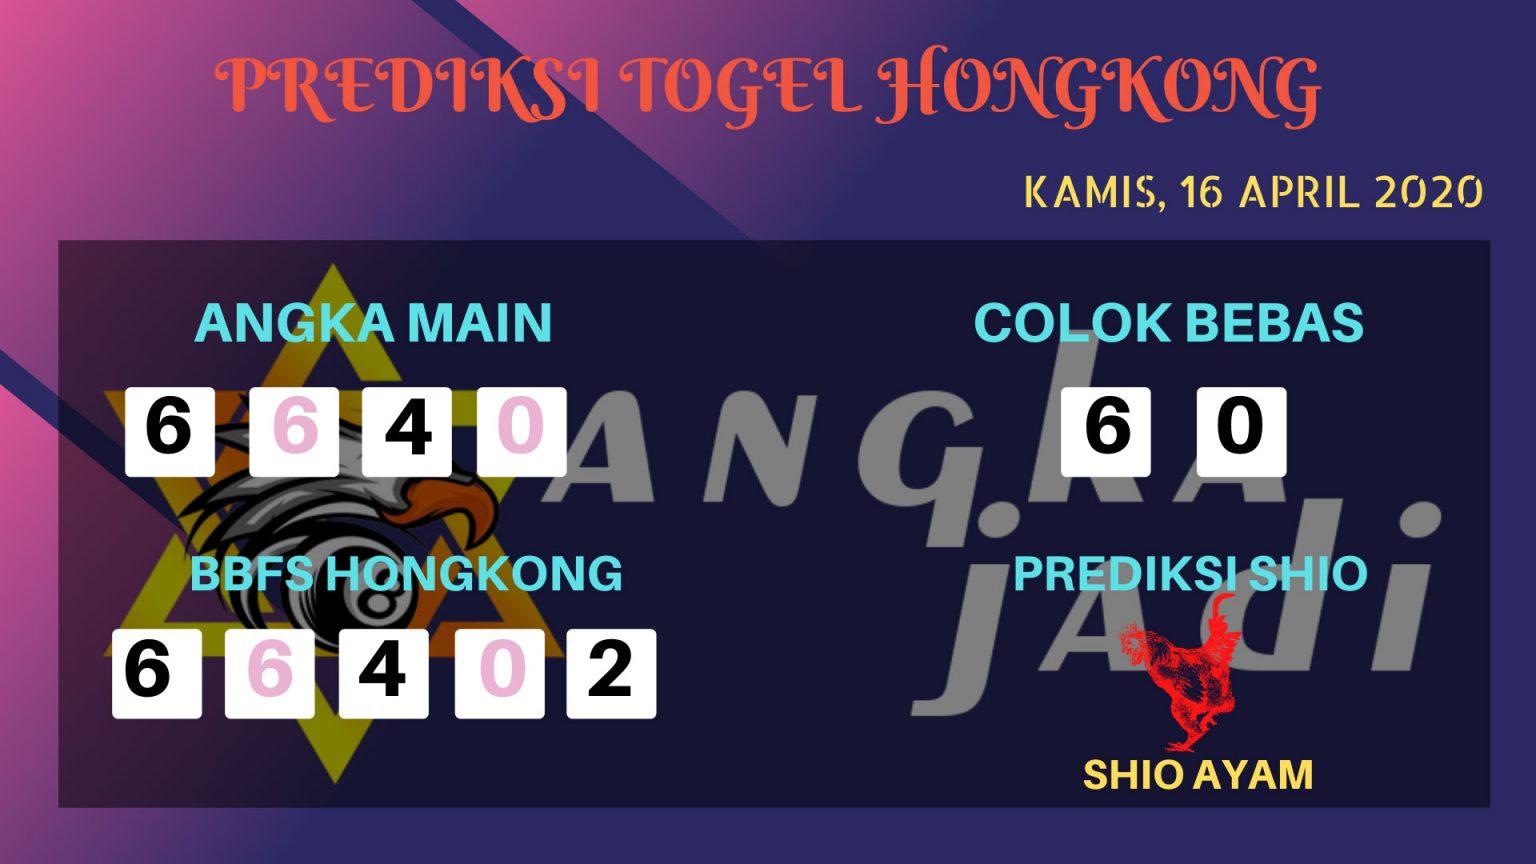 Prediksi HK Malam Ini 16 April 2020 - Prediksi Angka HK